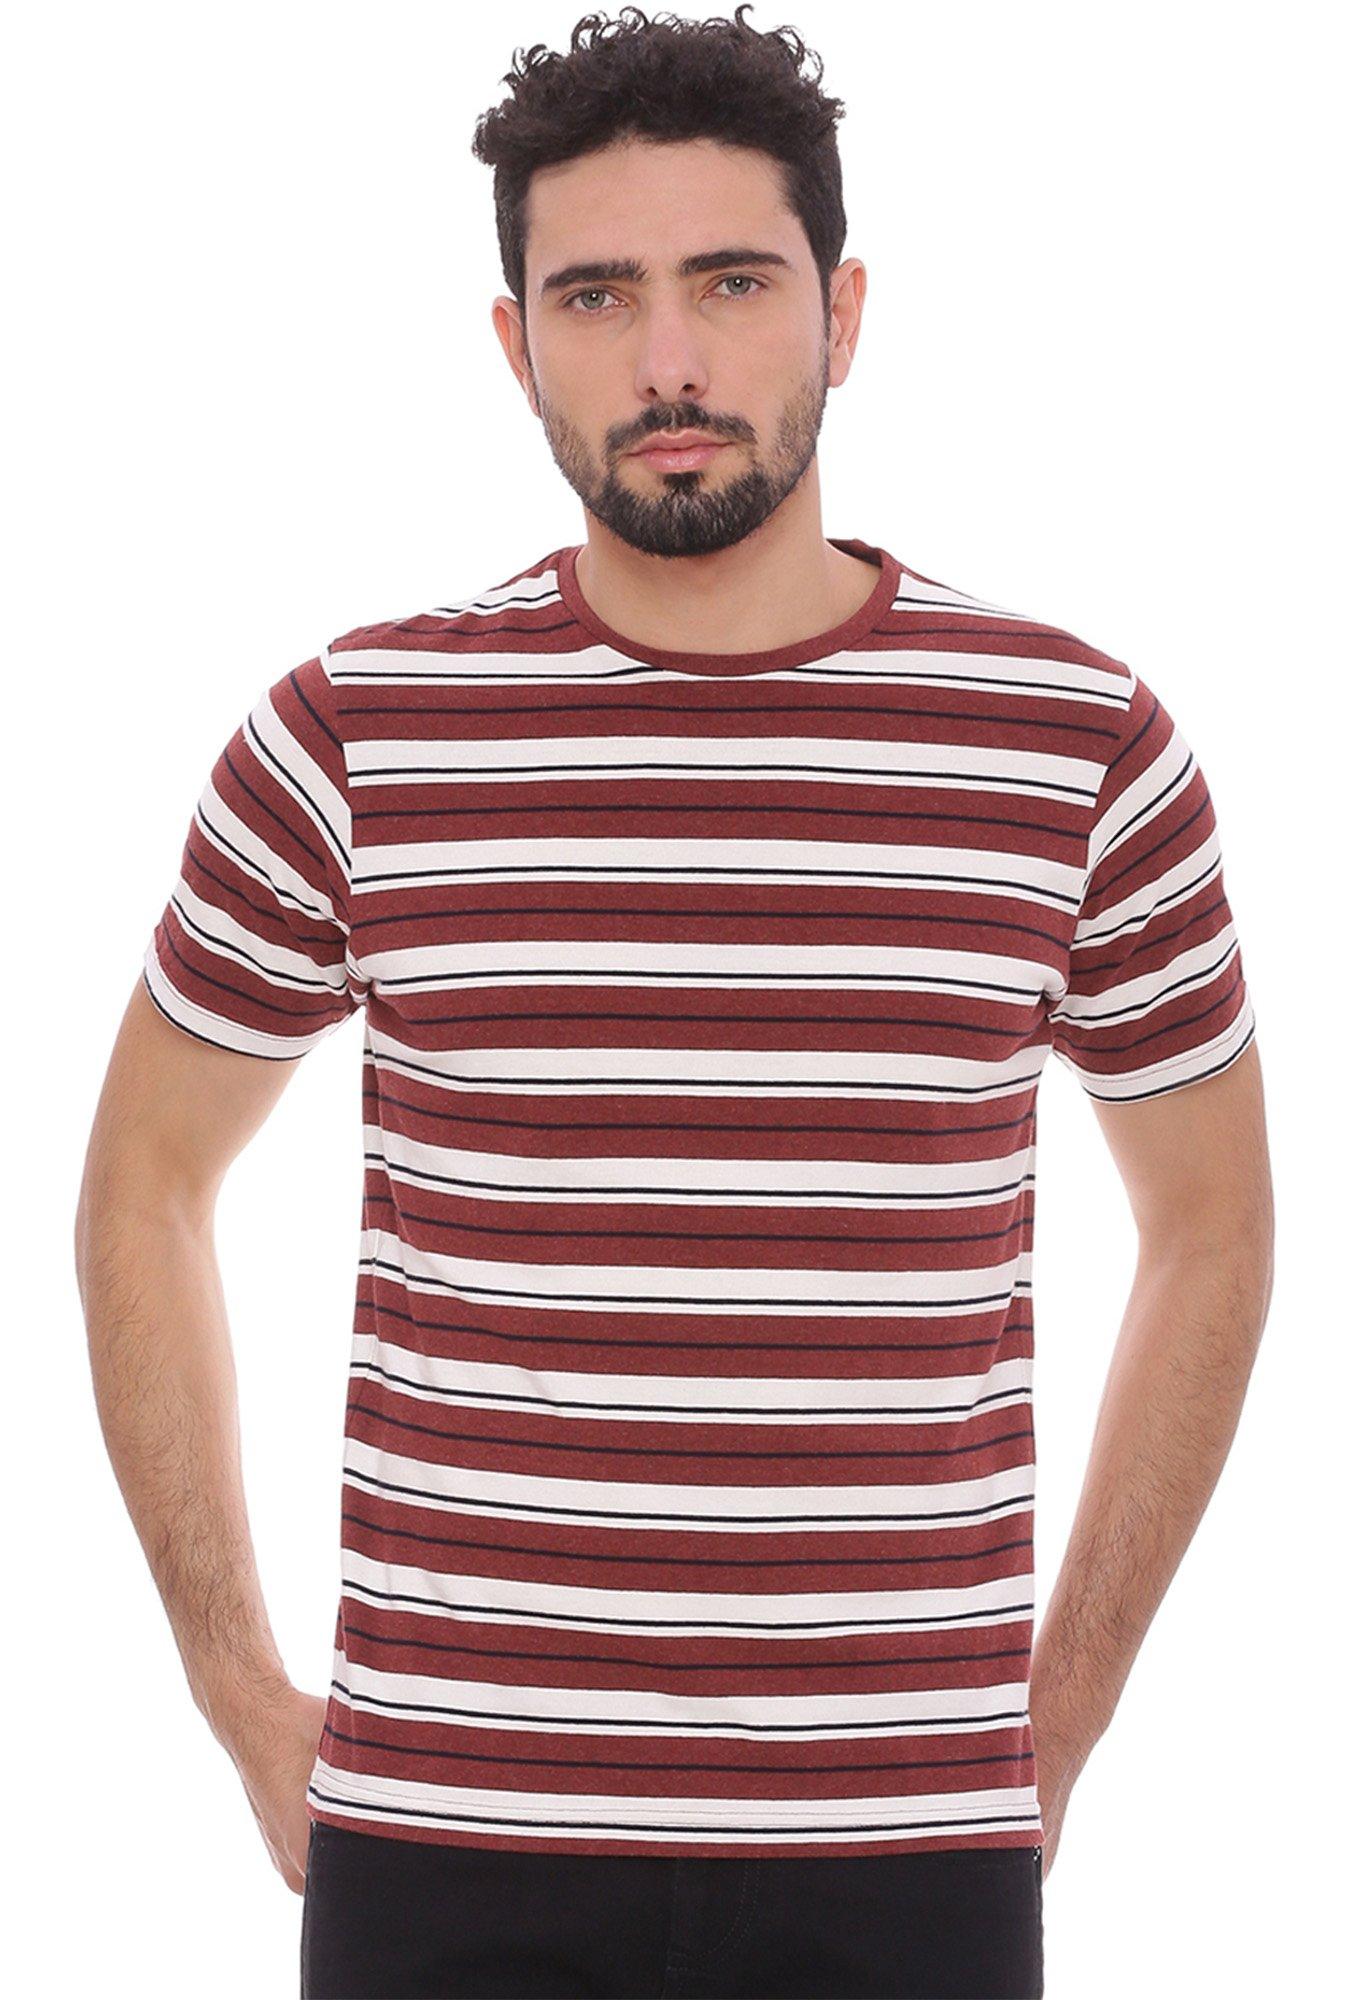 Buy basics maroon white striped t shirt for men online for Maroon t shirt for men